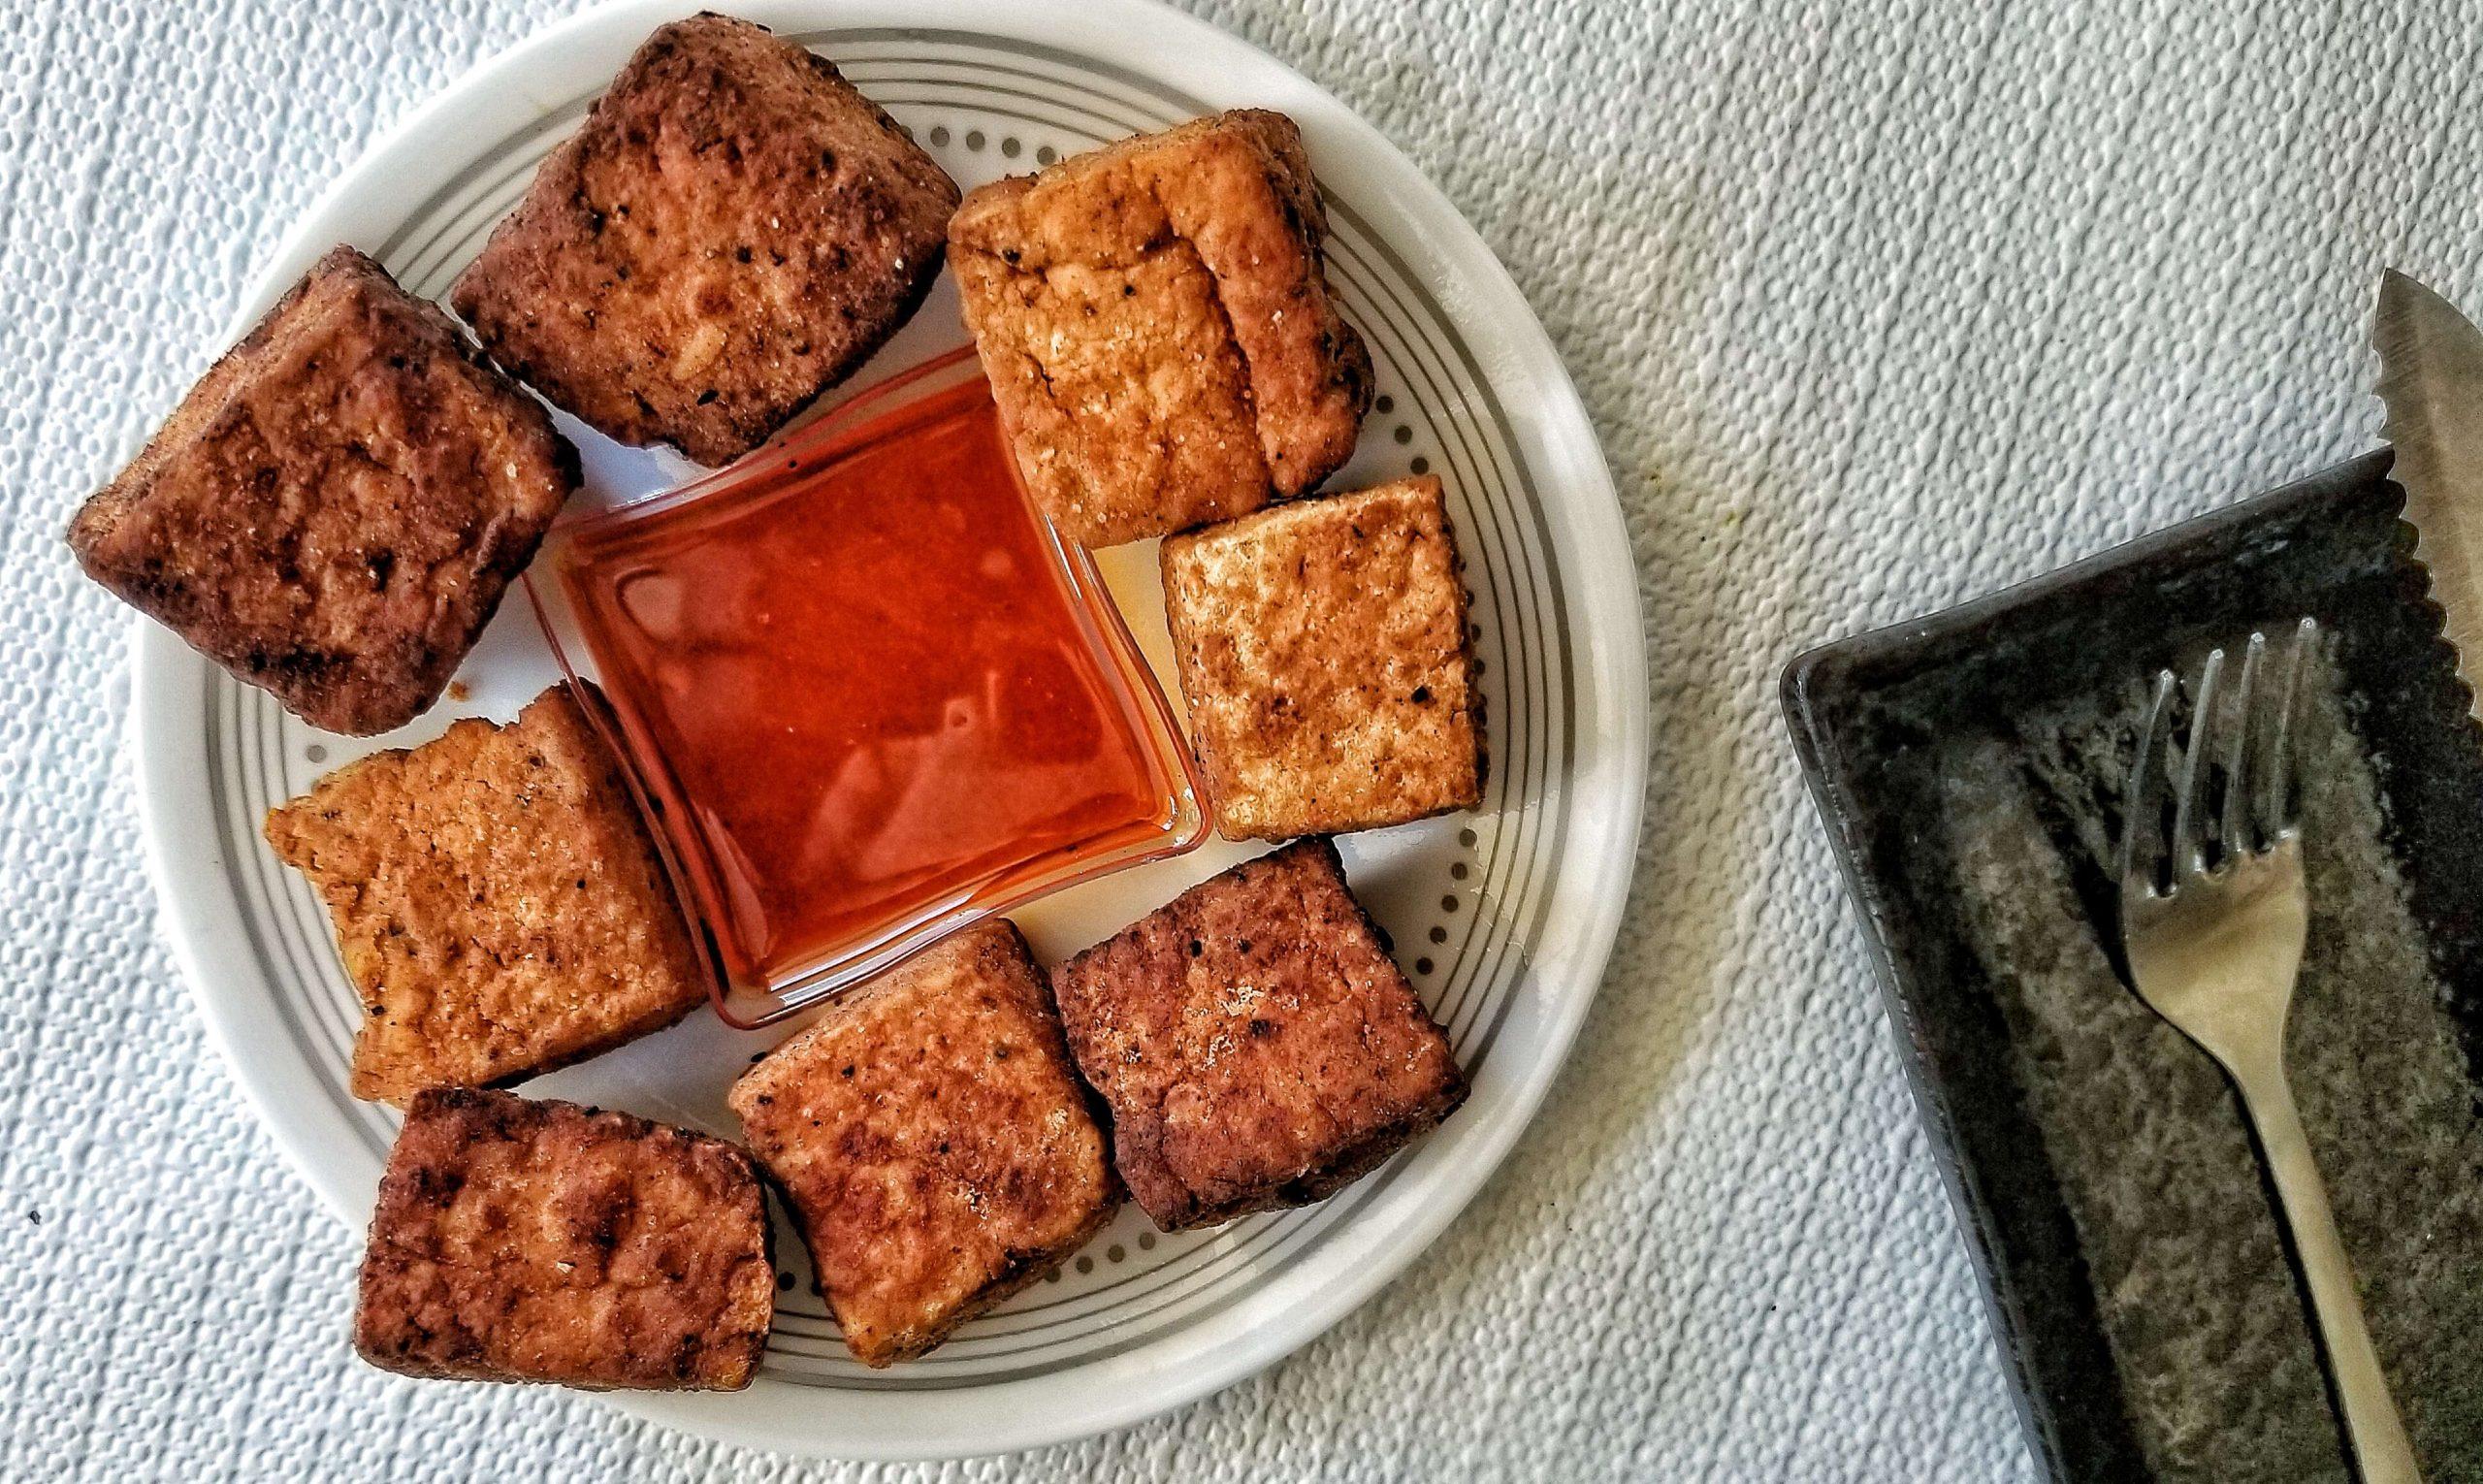 Large chunks of pan-fried firm tofu